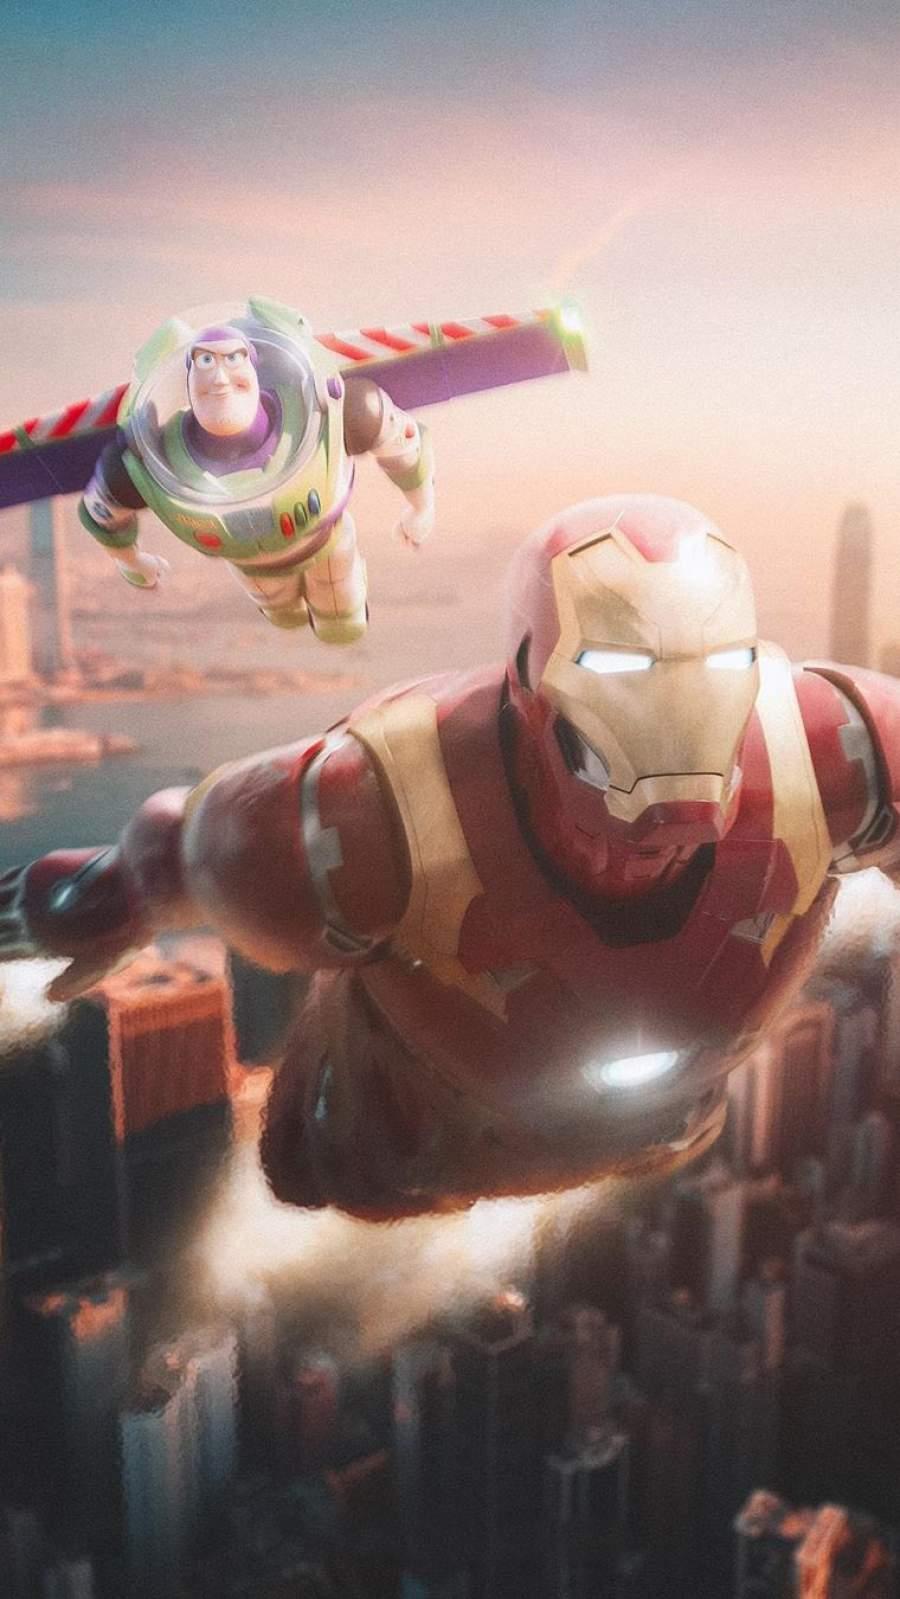 Iron Man with Buzz Lightyear iPhone Wallpaper